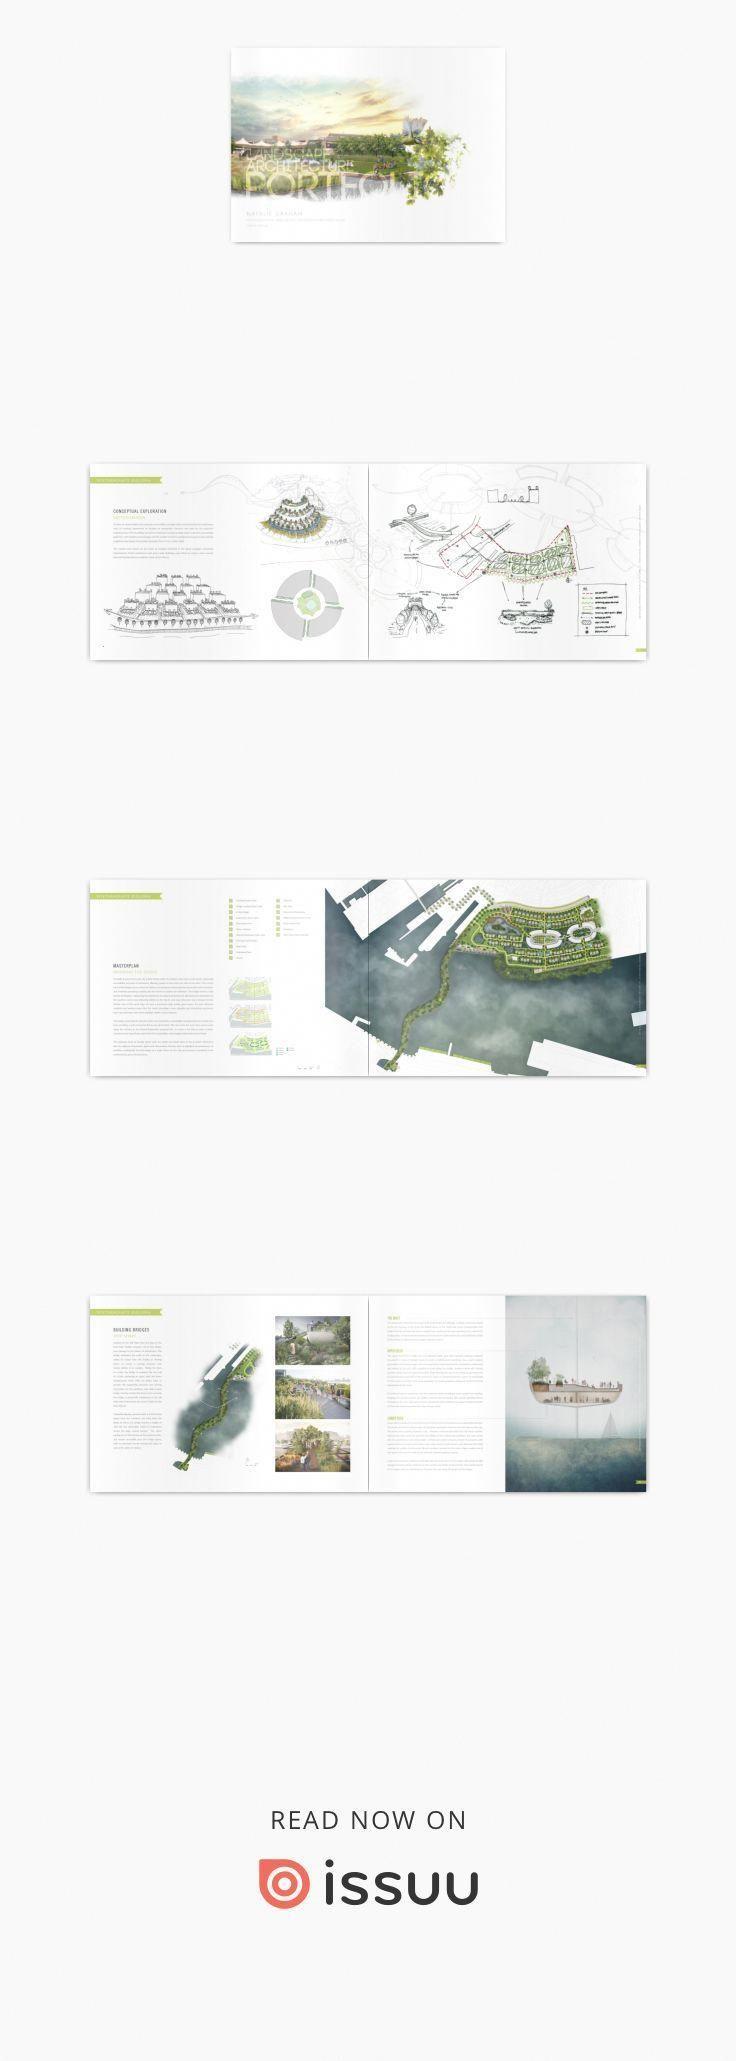 Postgraduate Landscape Architecture Portfolio Natalie Graham A Selection Of Wor Postgraduate Landscape Architecture Portfolio Natalie Landscape Design Software Architecture Portfolio Landscape Architecture Portfolio